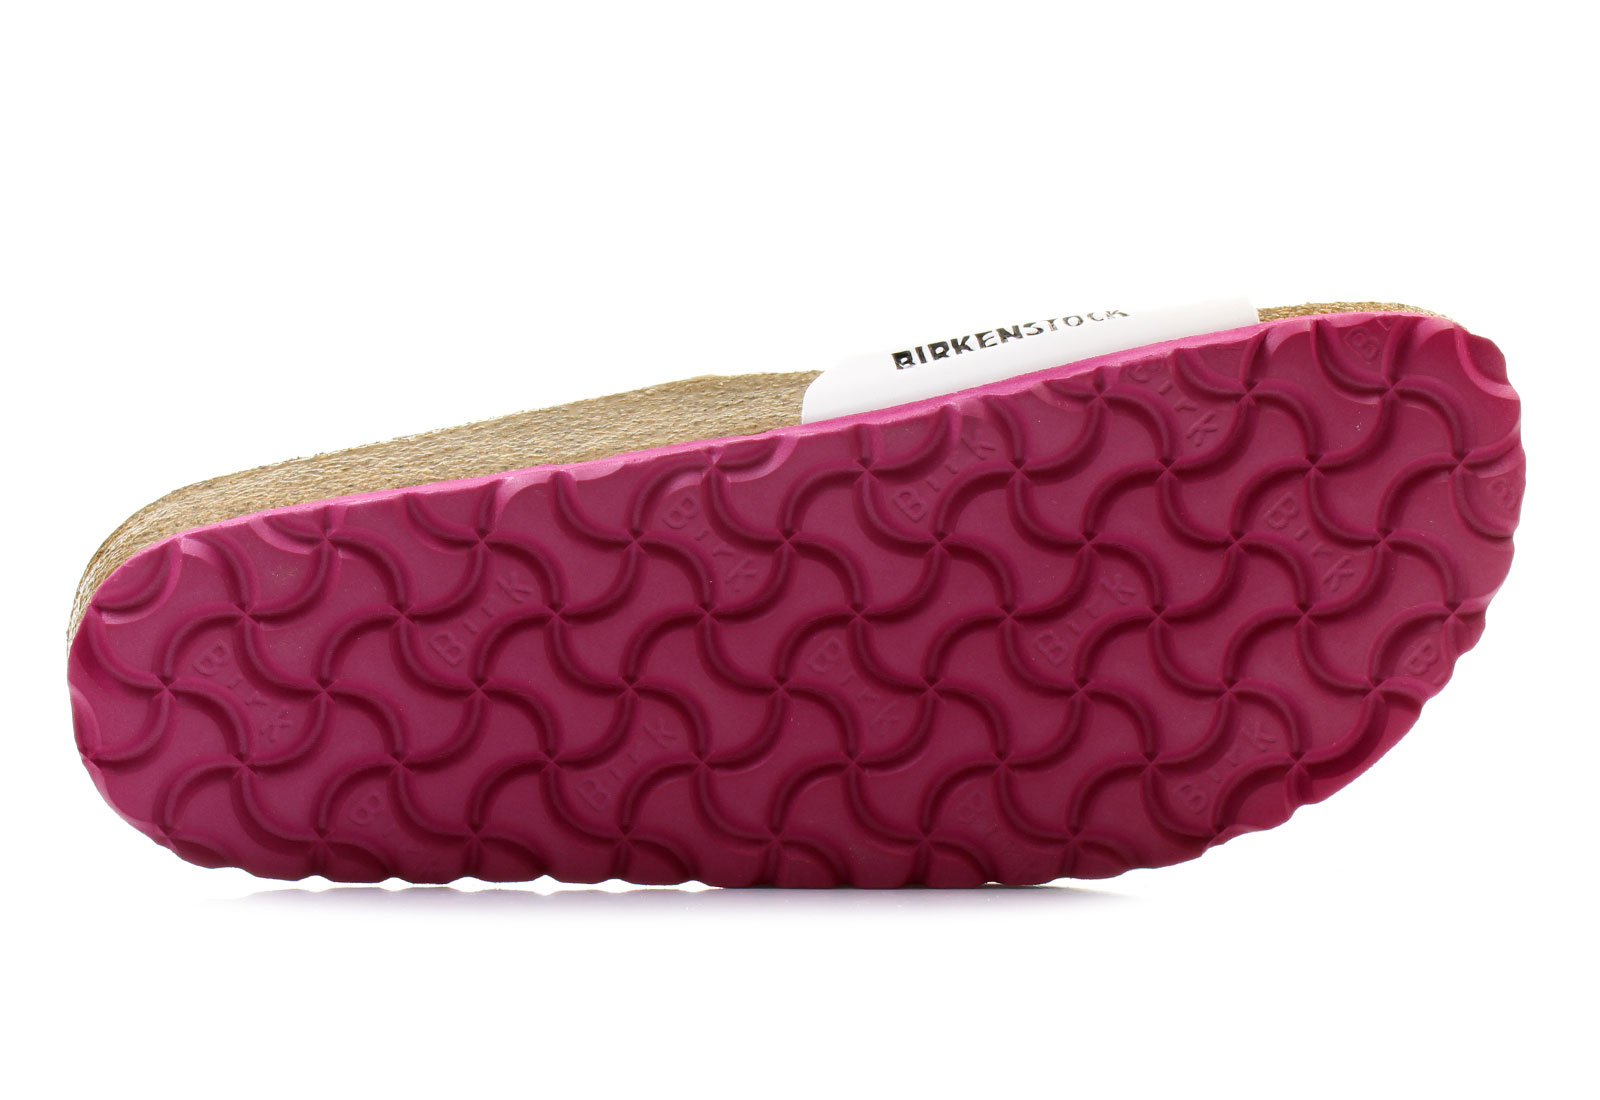 3b62f2a1e1 Birkenstock Papucs - Madrid Papucs - 339413-wht - Office Shoes ...